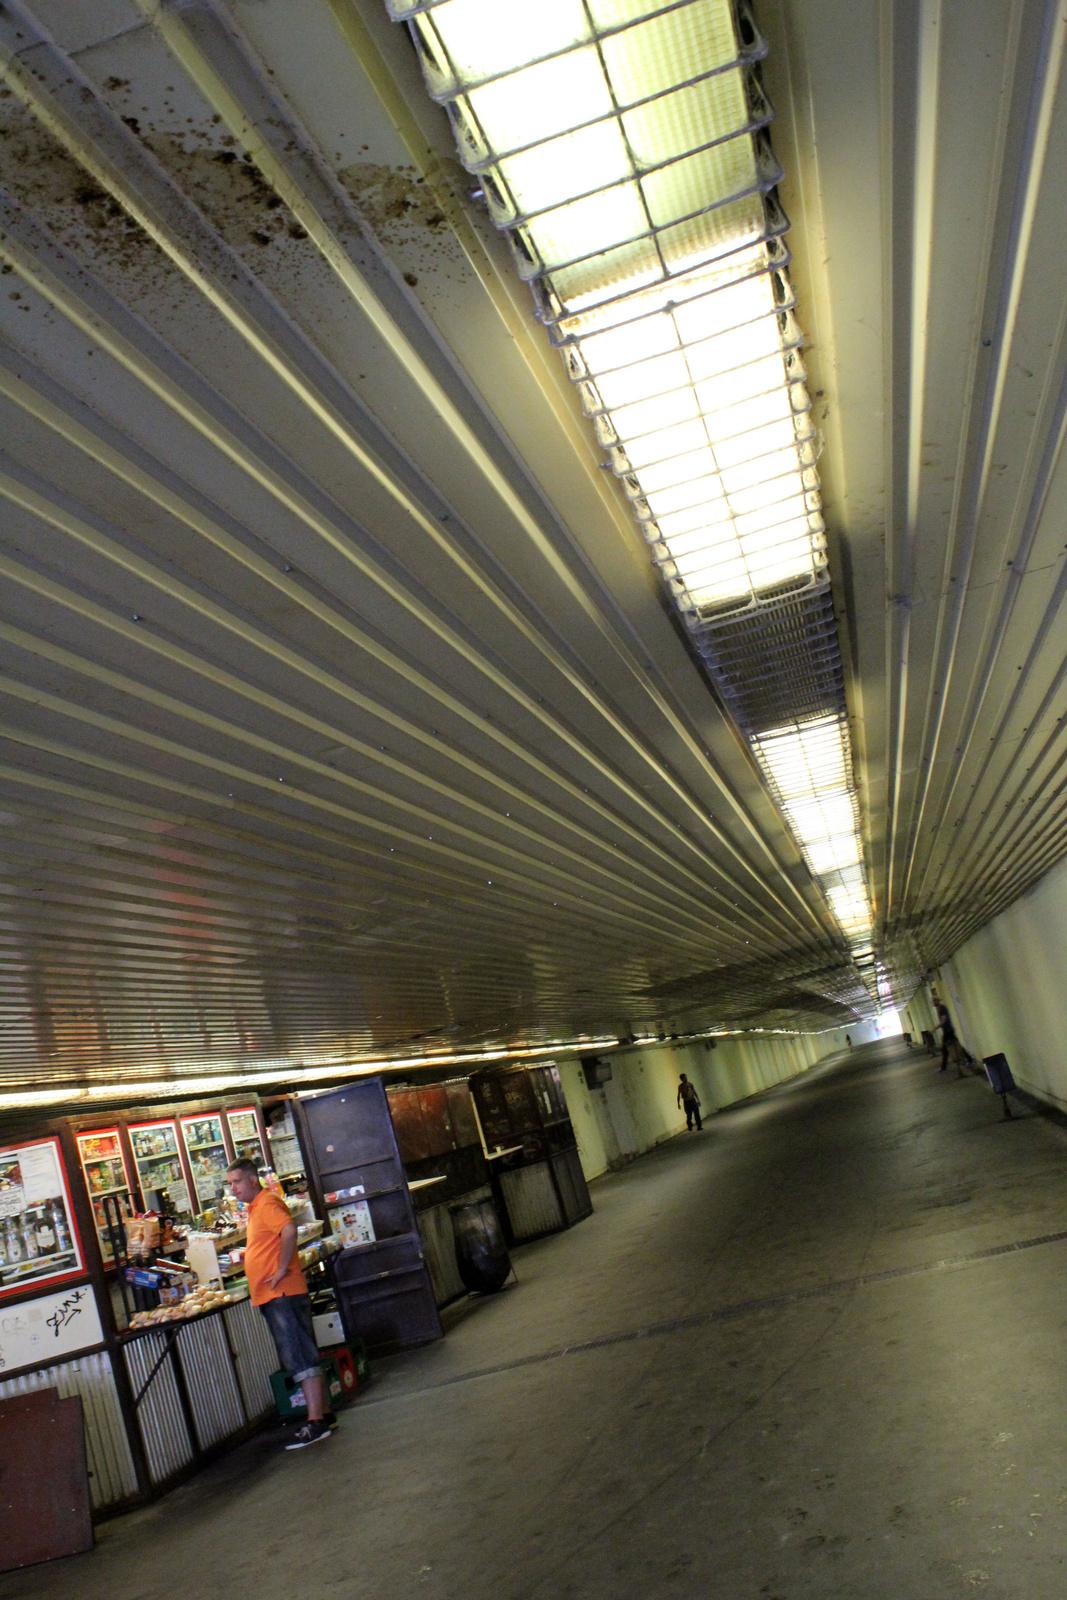 Metro4-KelenfoldVasutallomas-20150817-10